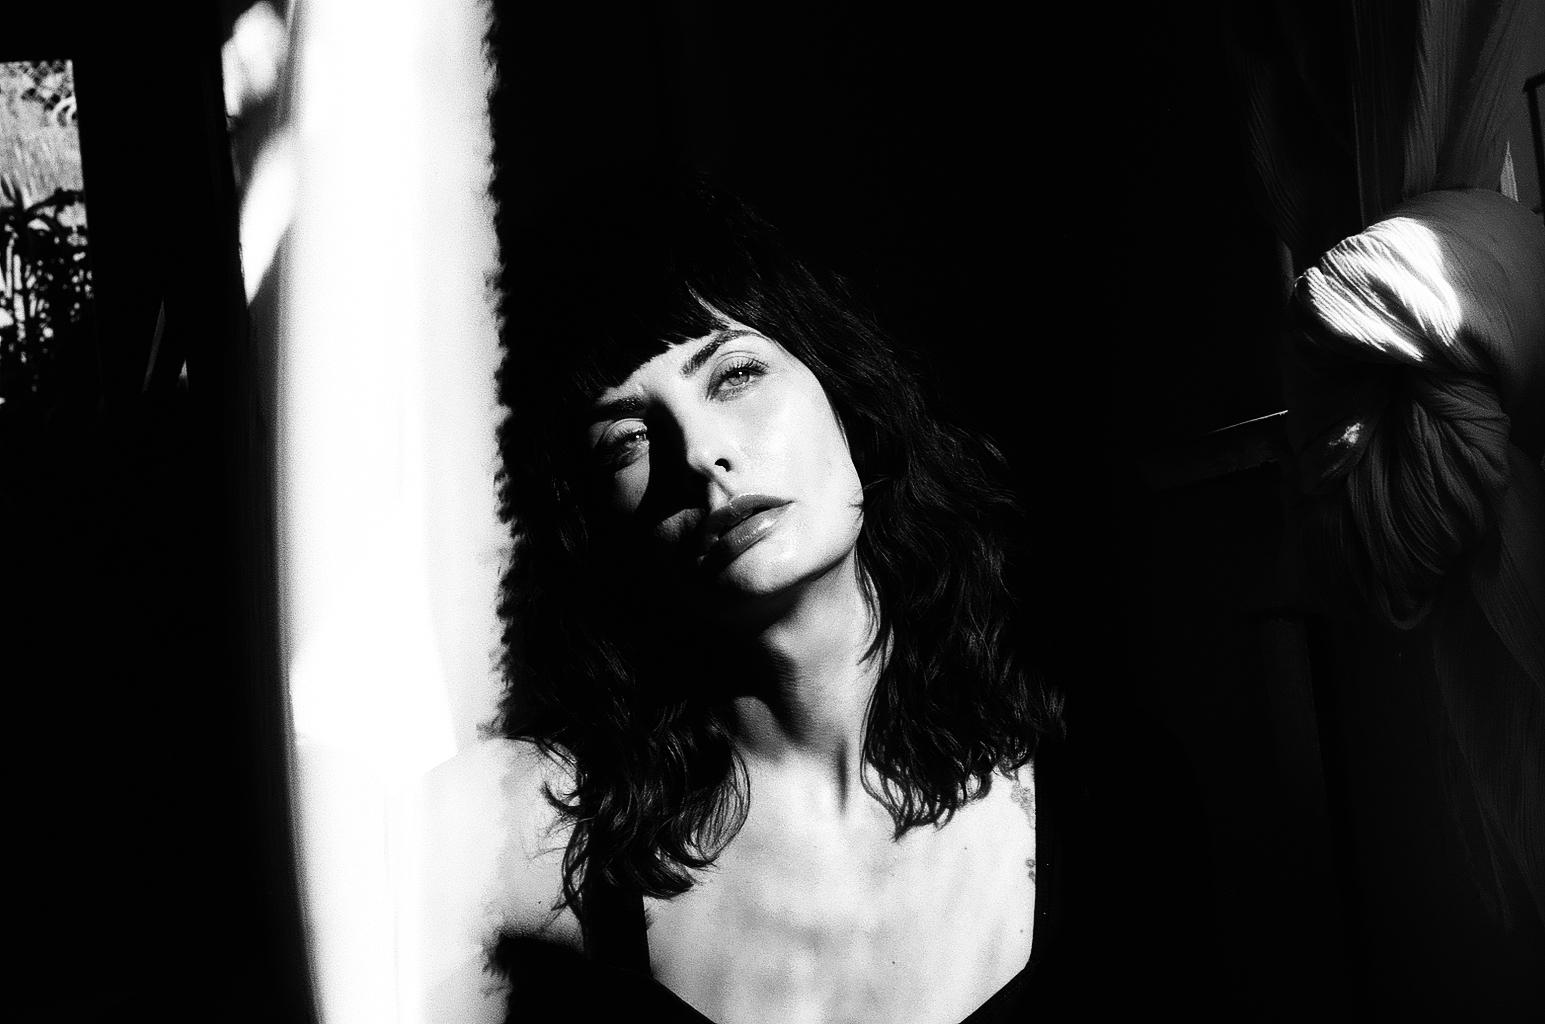 Natalia (Pic: Anna Lisa Wagner)